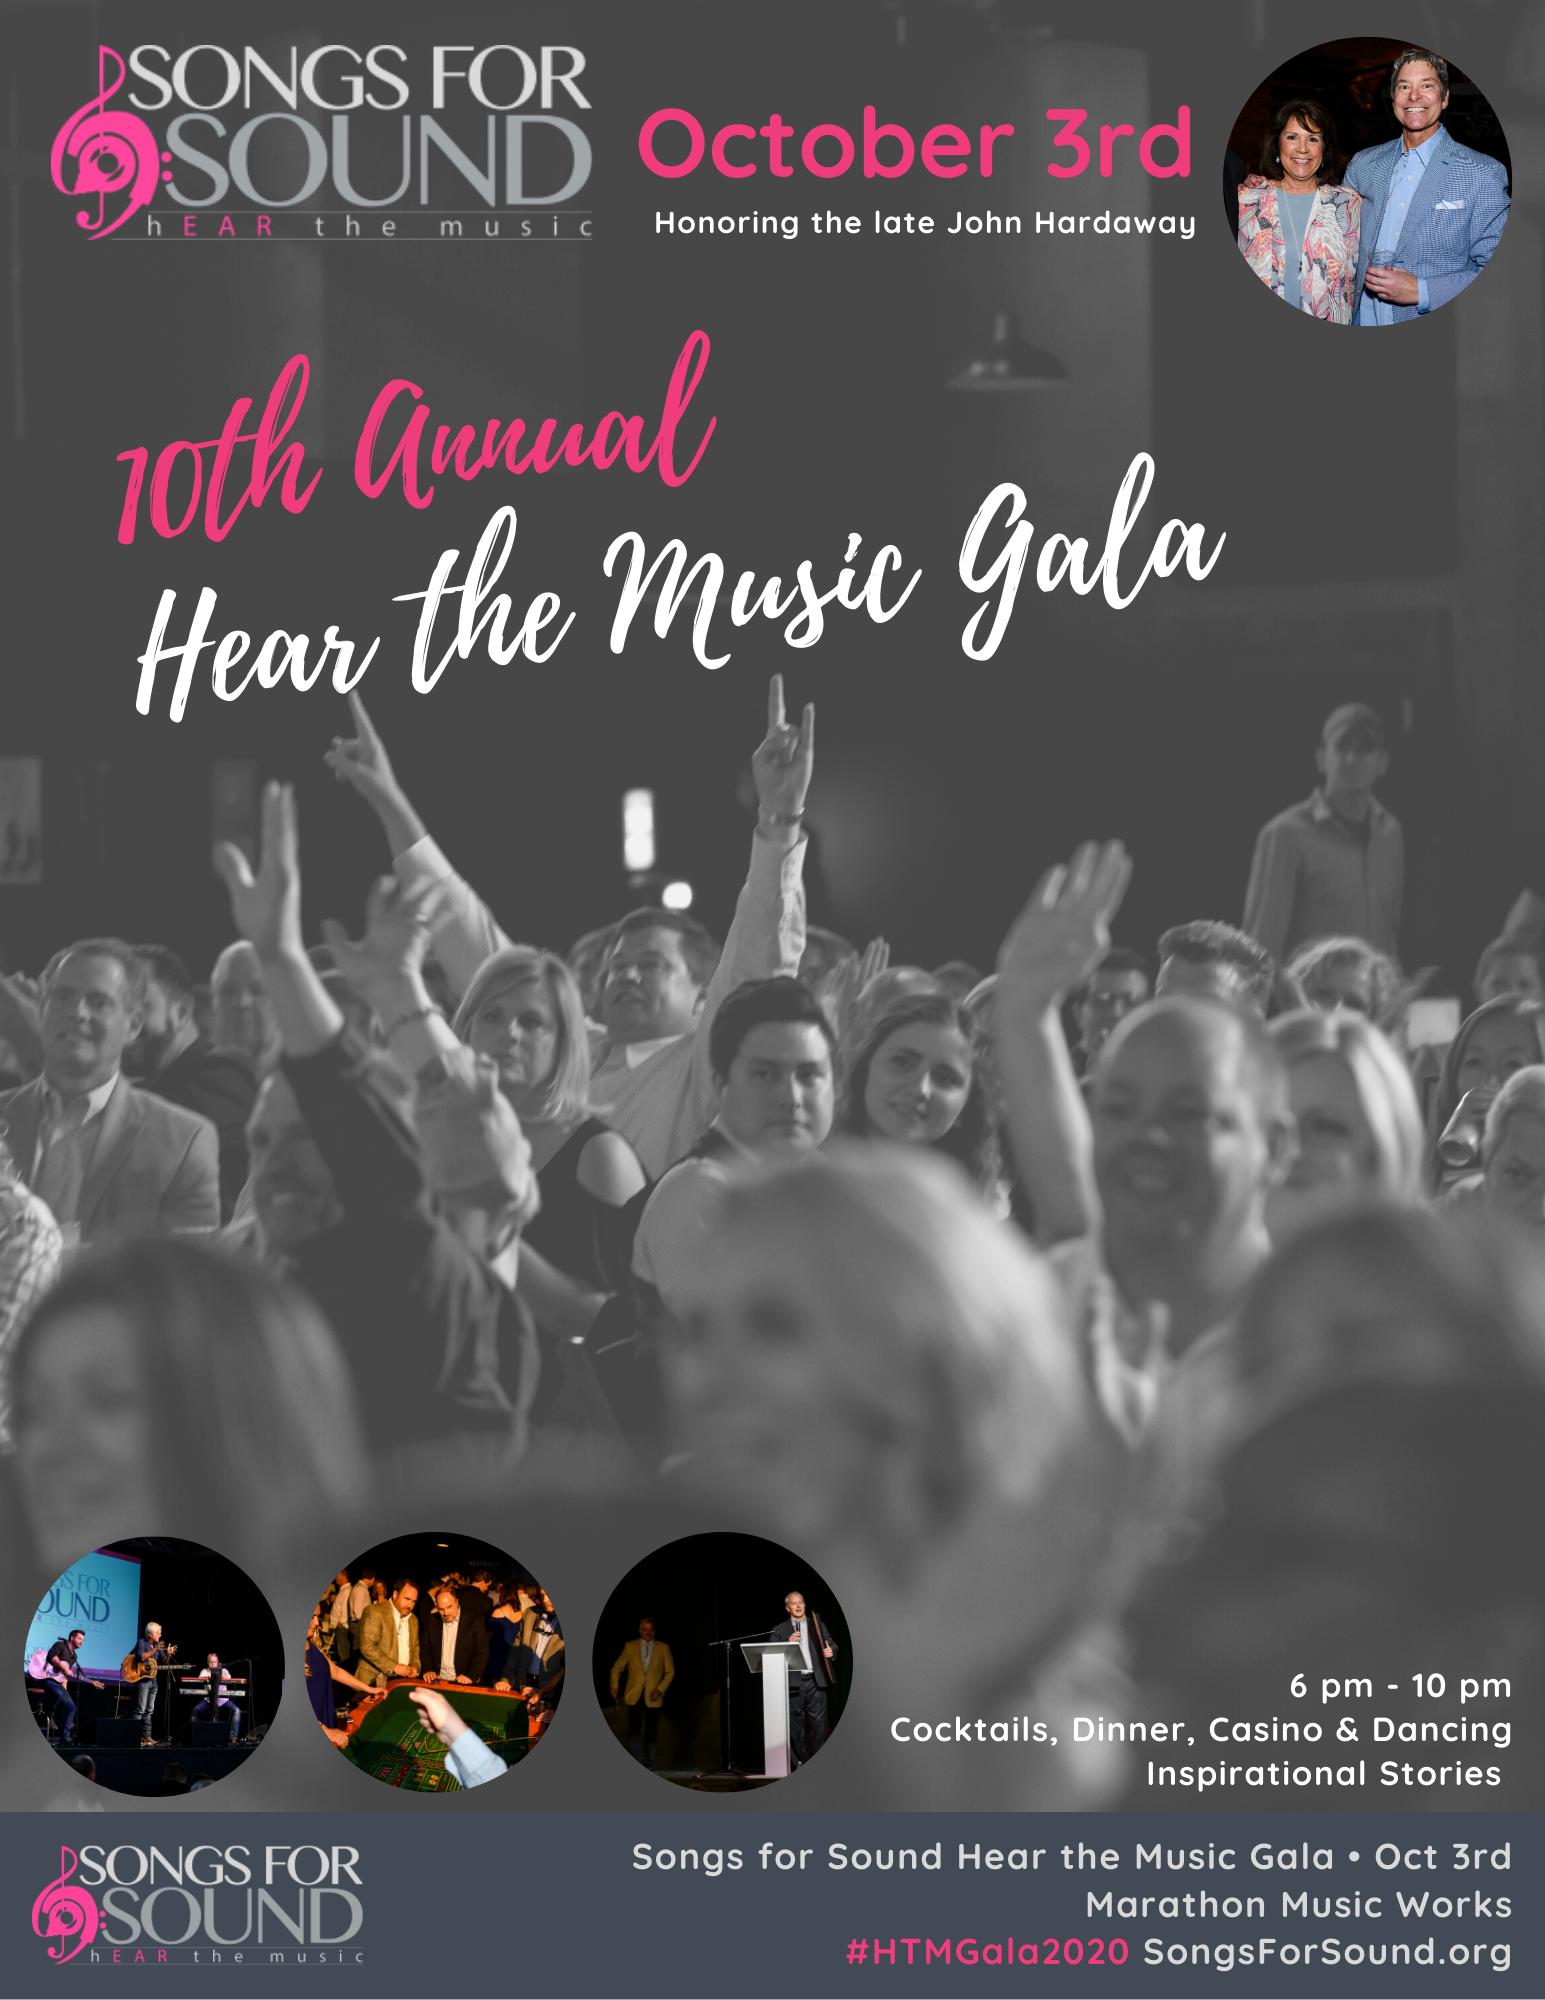 2020 Hear the Music Gala Sponsorship - Be an Event Sponsor